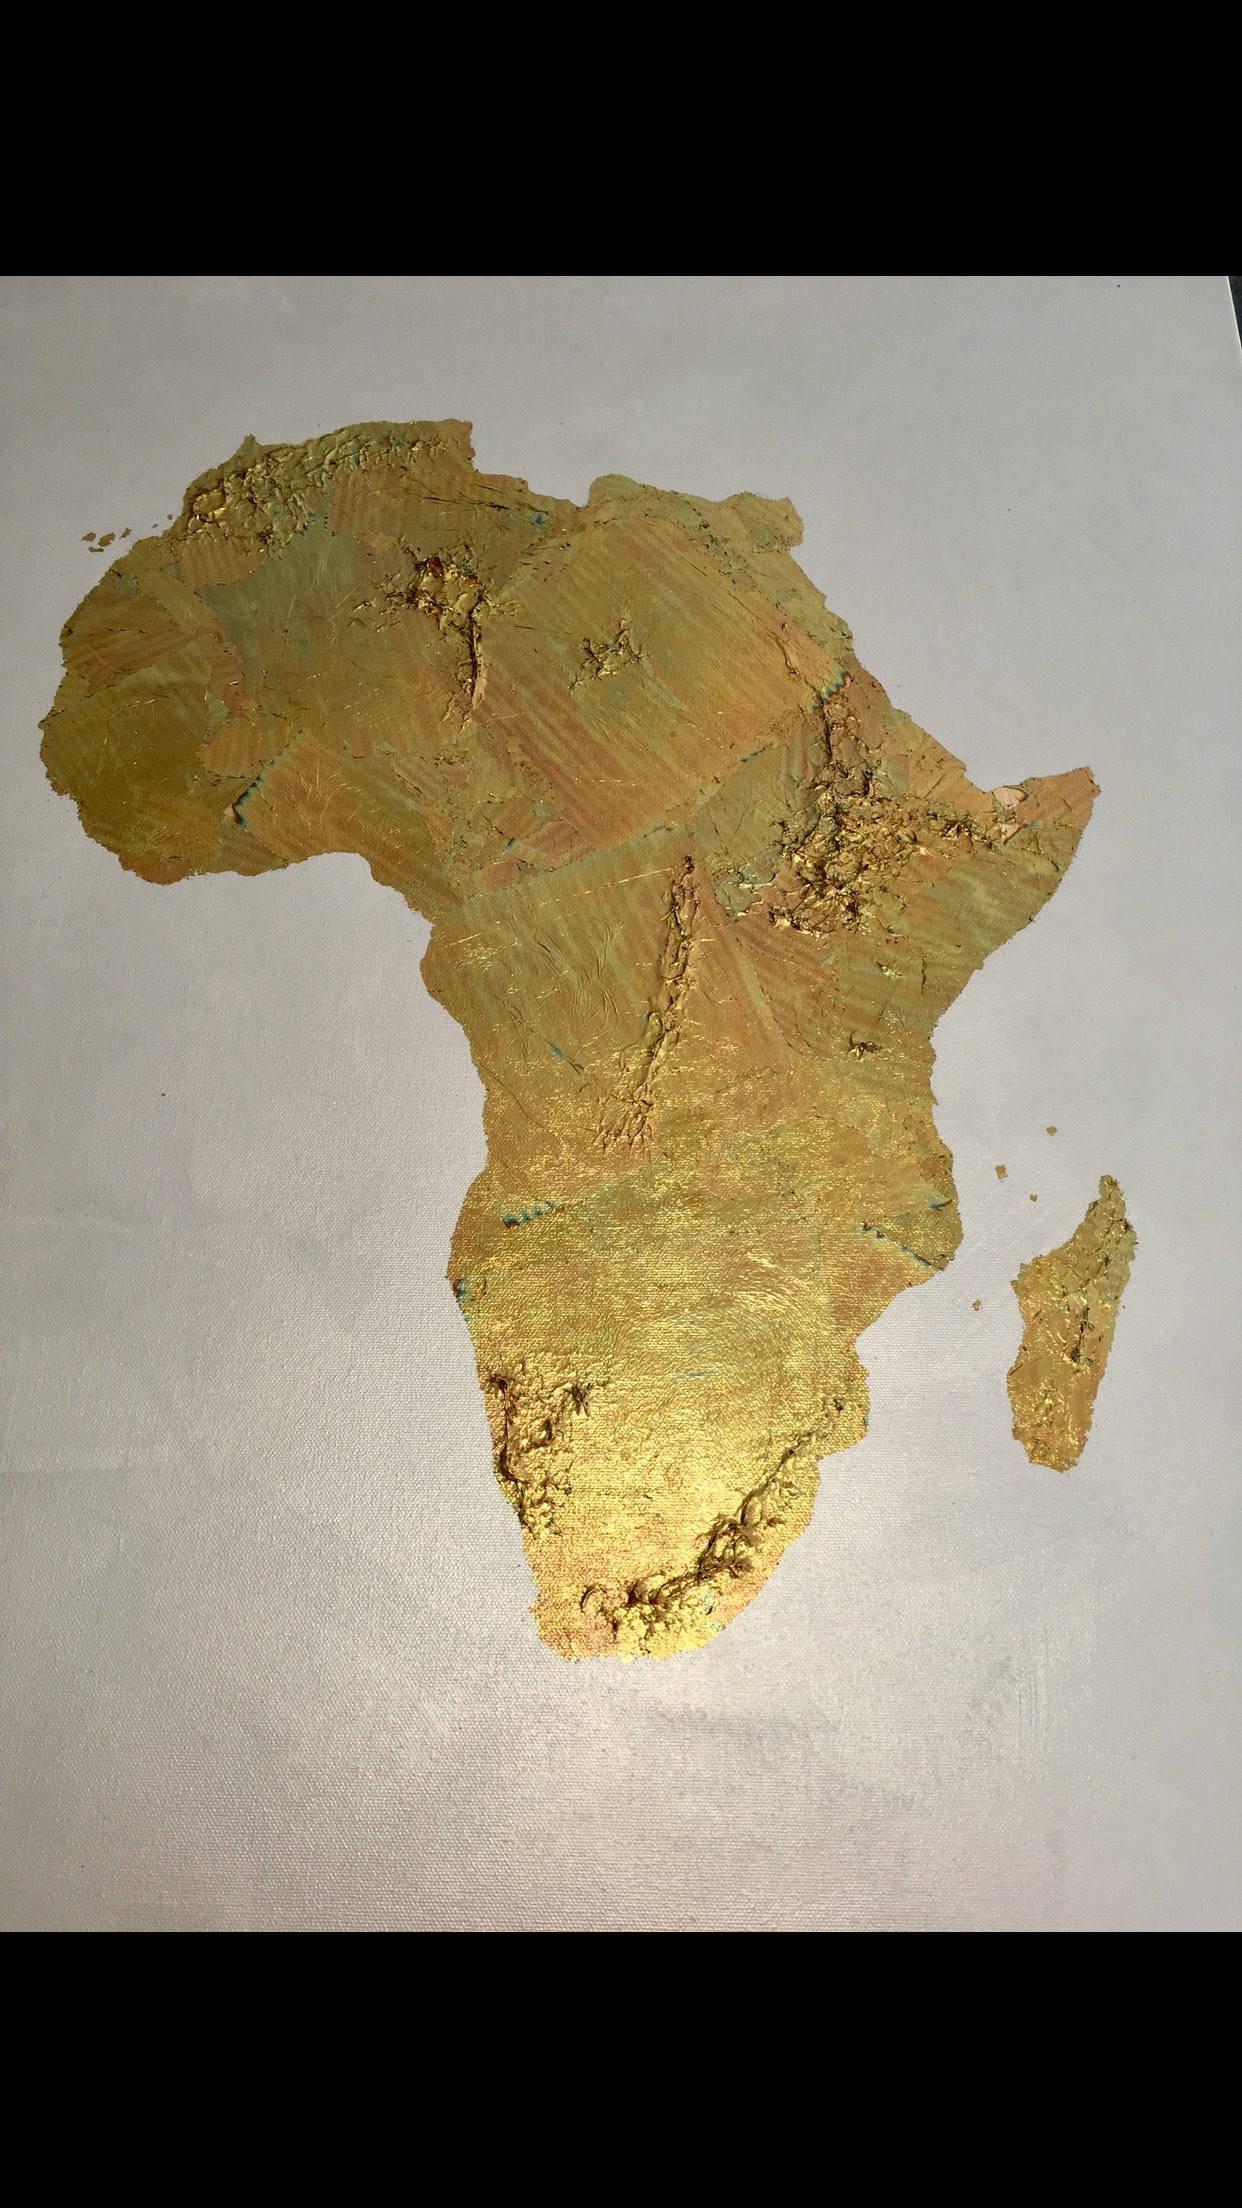 Gold leaf map original gold leaf map of the world gold leaf gold leaf map of africa africa map africa love original gold leaf map of africa gumiabroncs Gallery